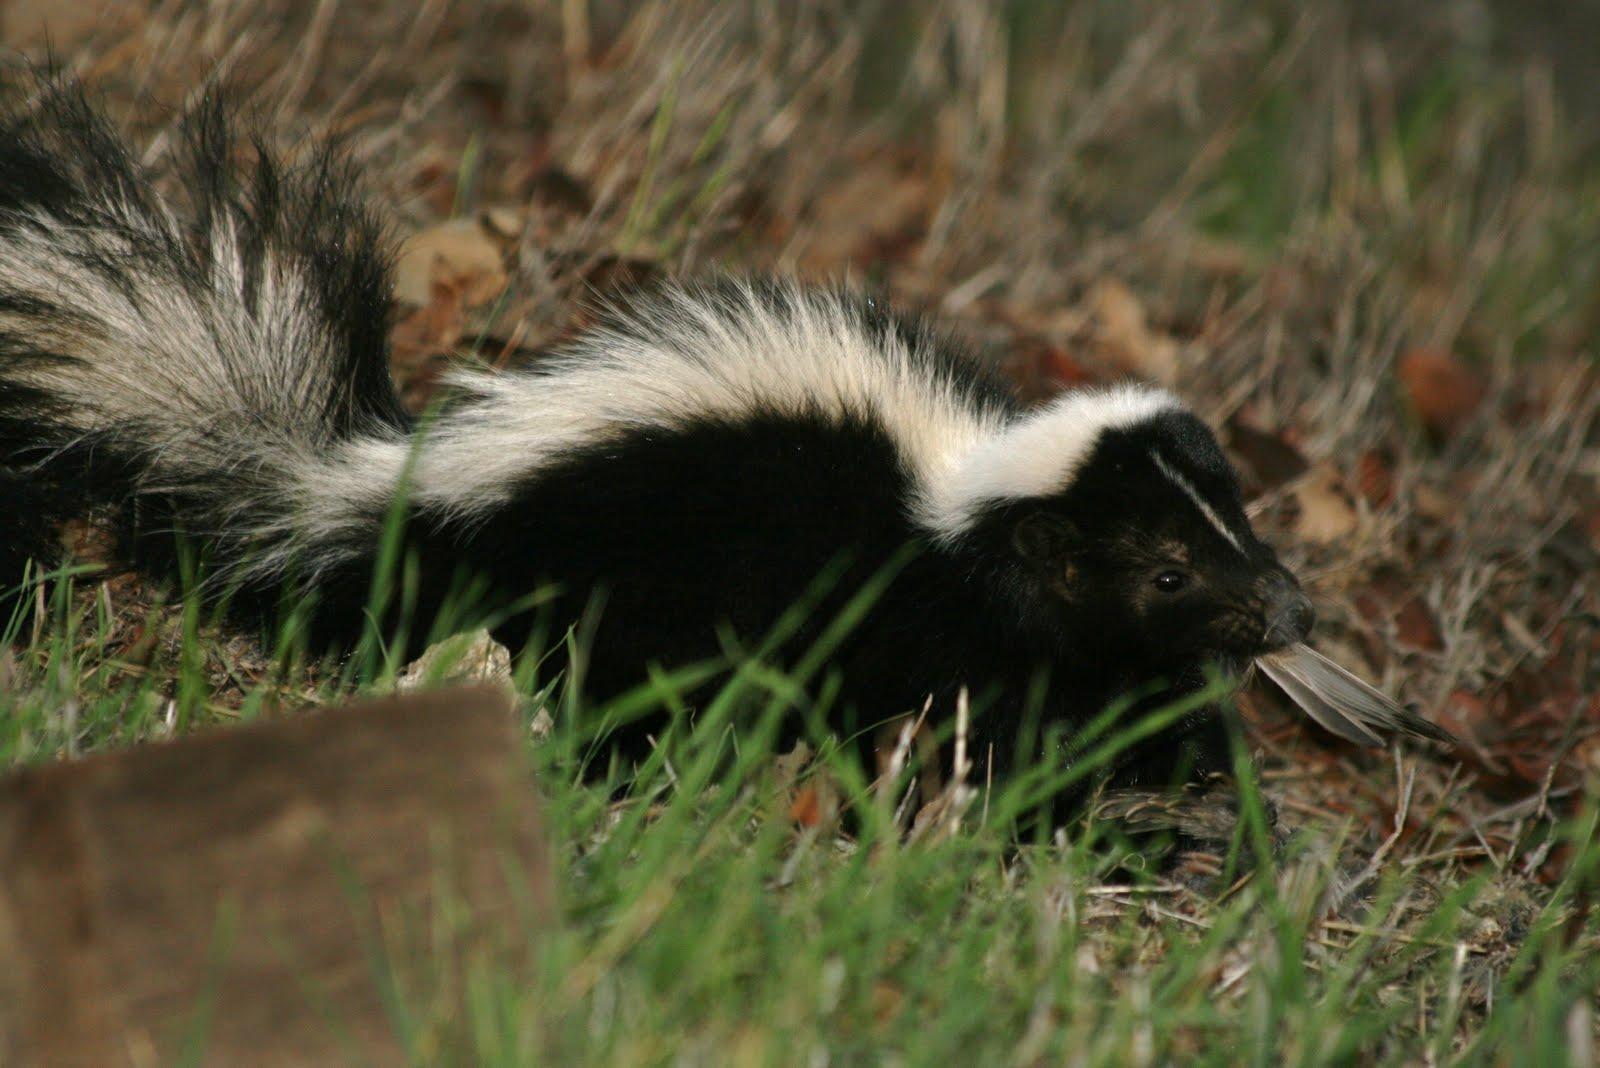 best friends norwalk wild animal wednesday skunks and dogs